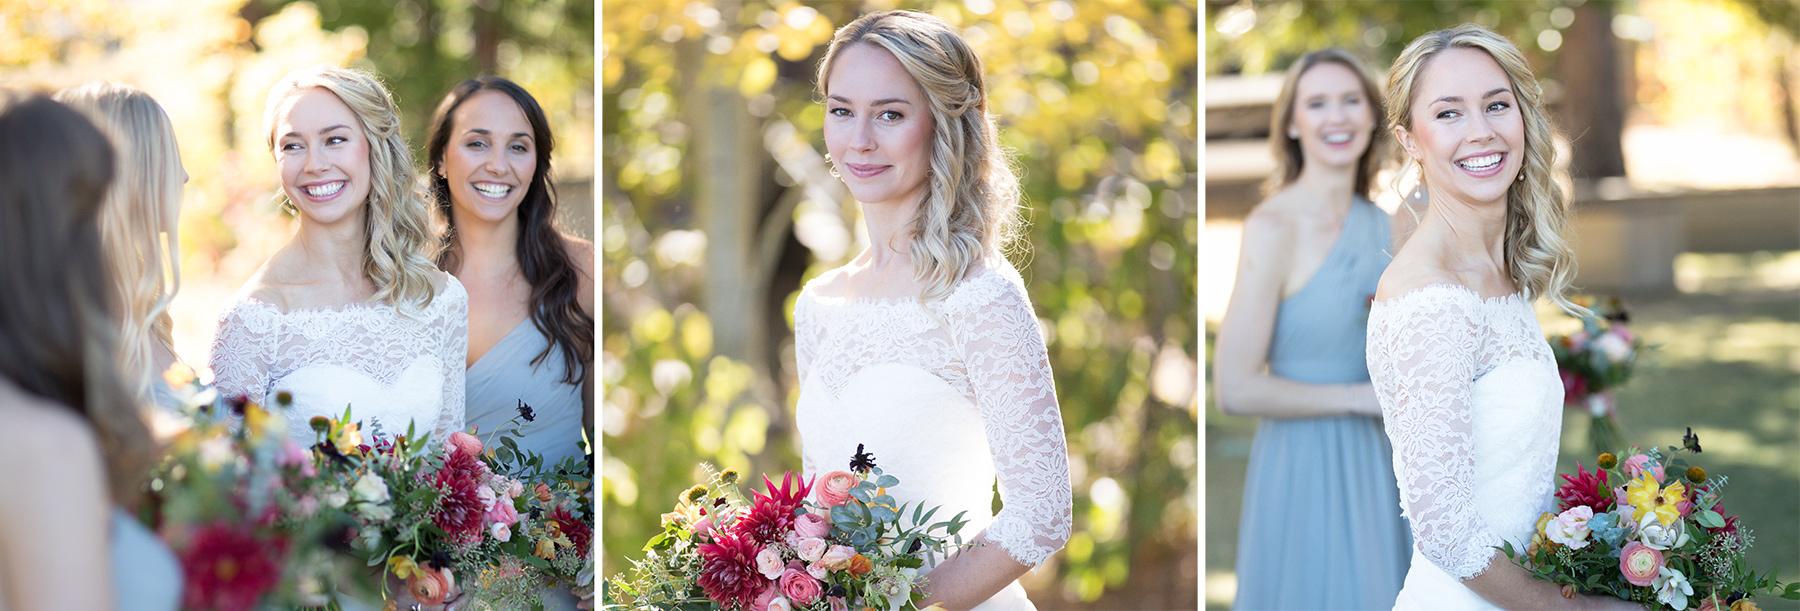 bride-flowers-and-friends-Tahoe